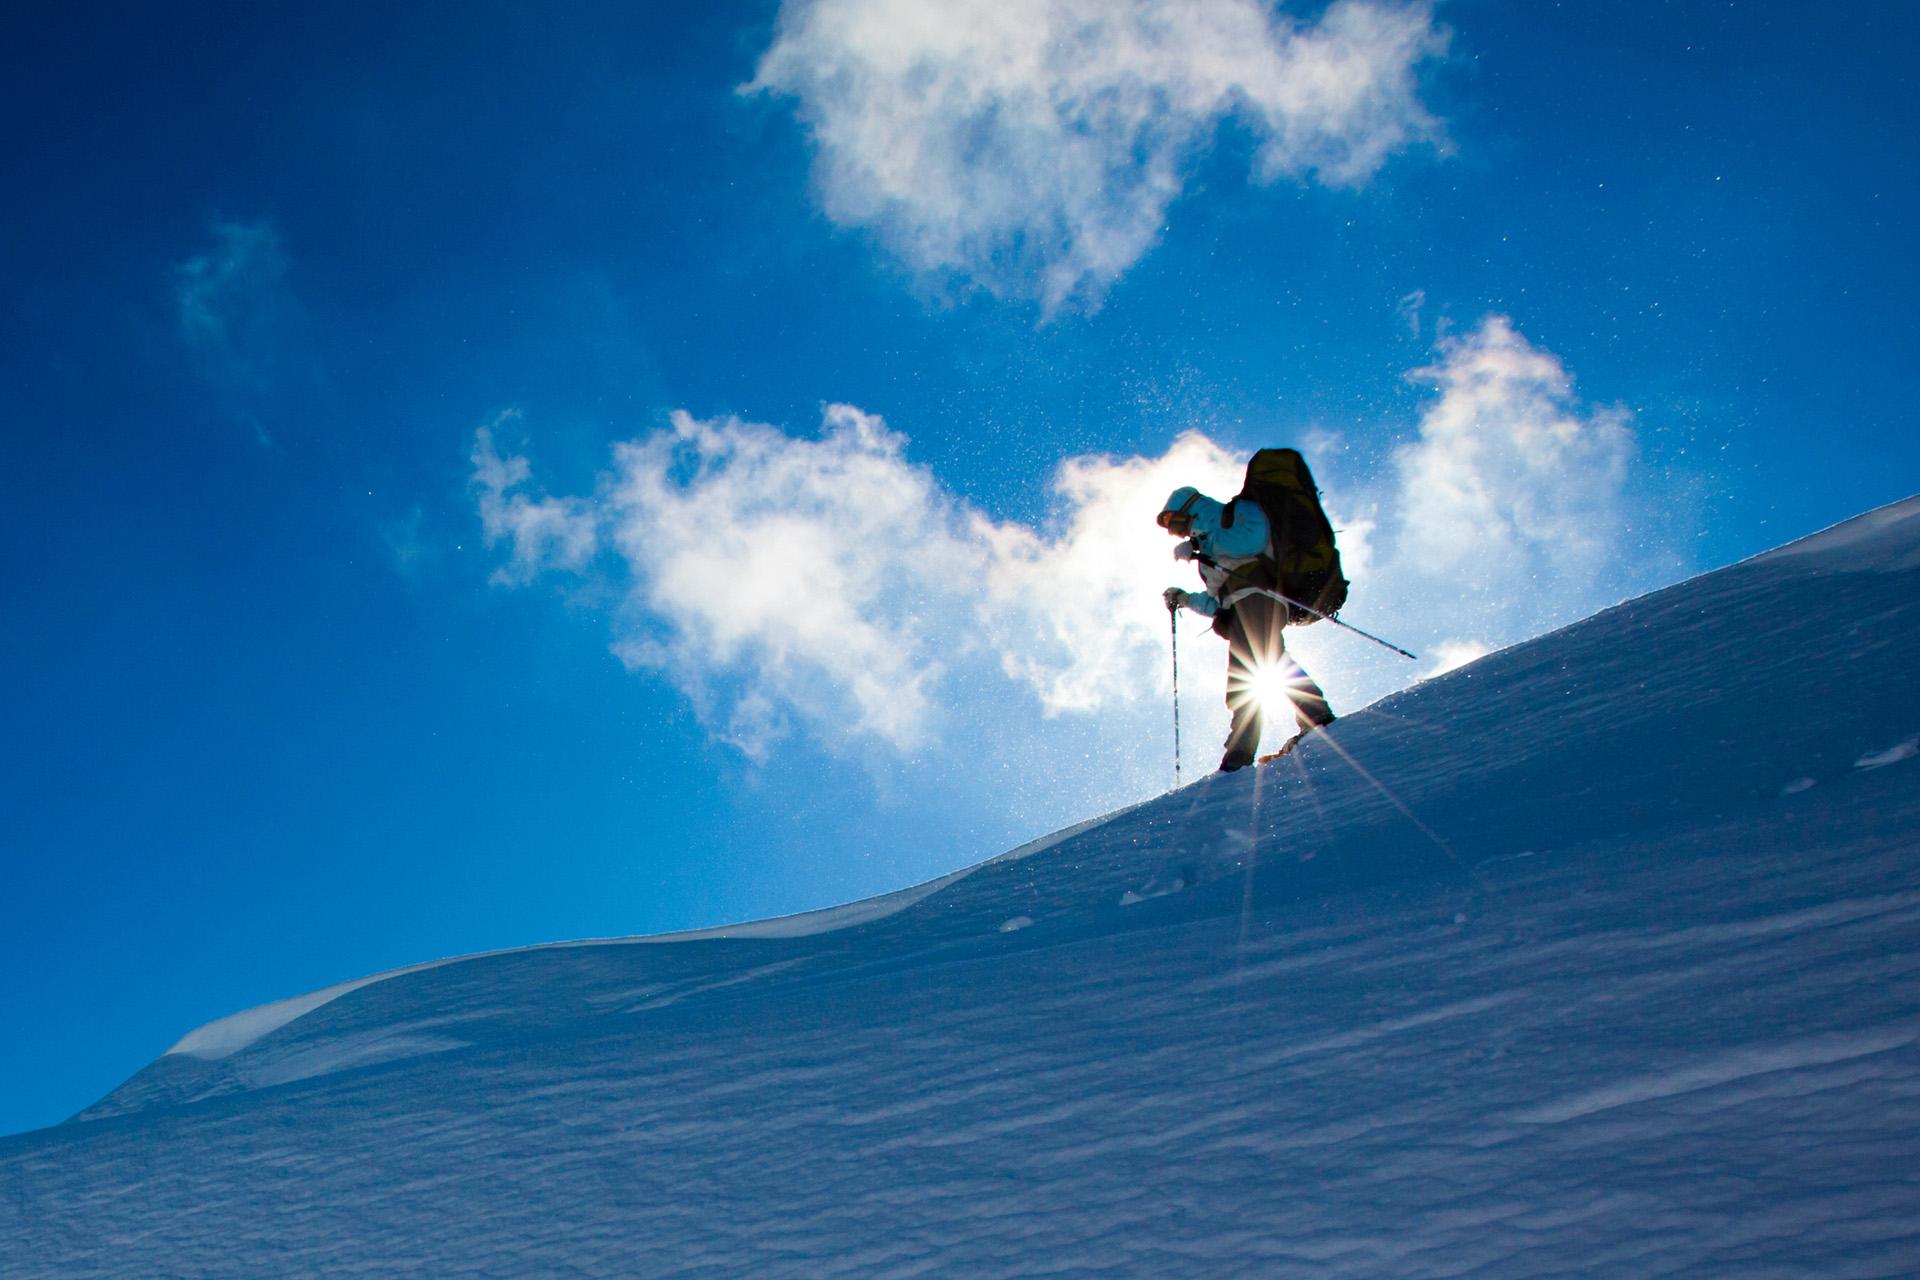 Krvavec - snow shoeing